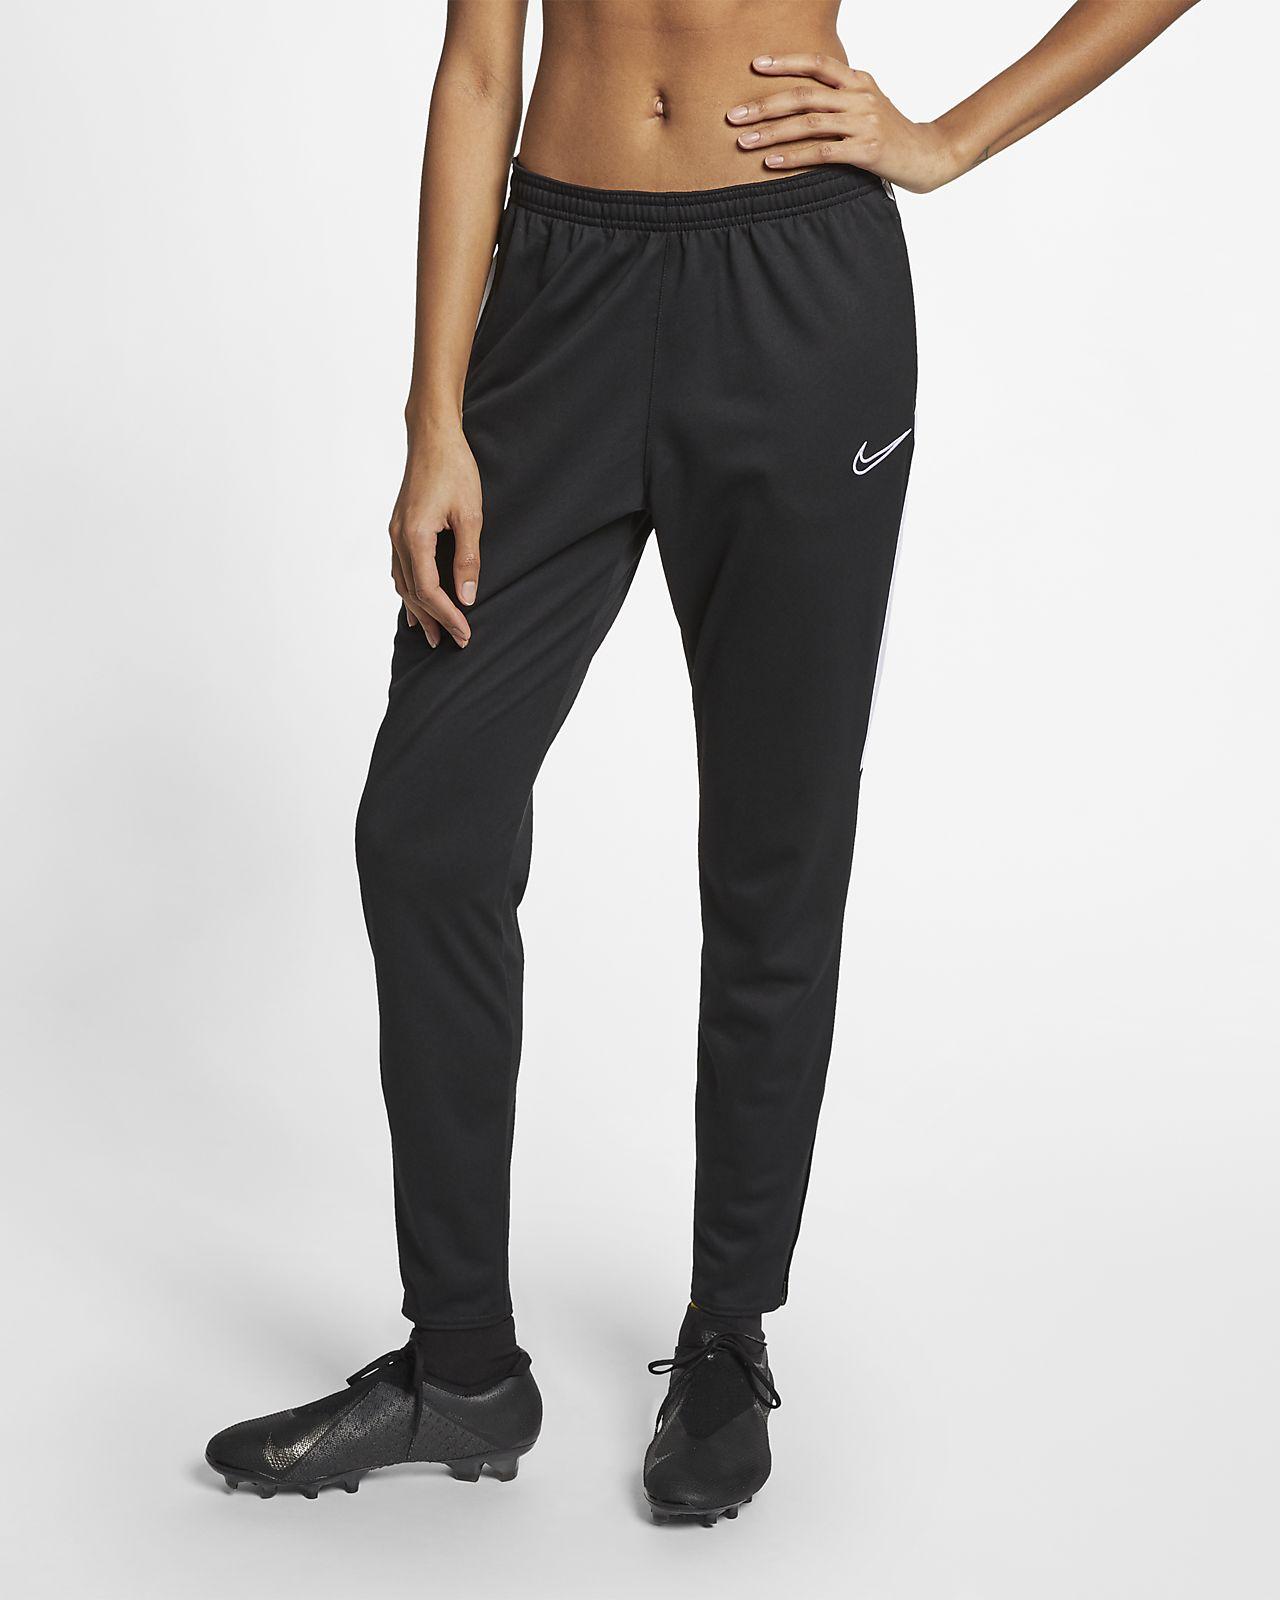 Nike Dri FIT Academy Damen Fußballhose